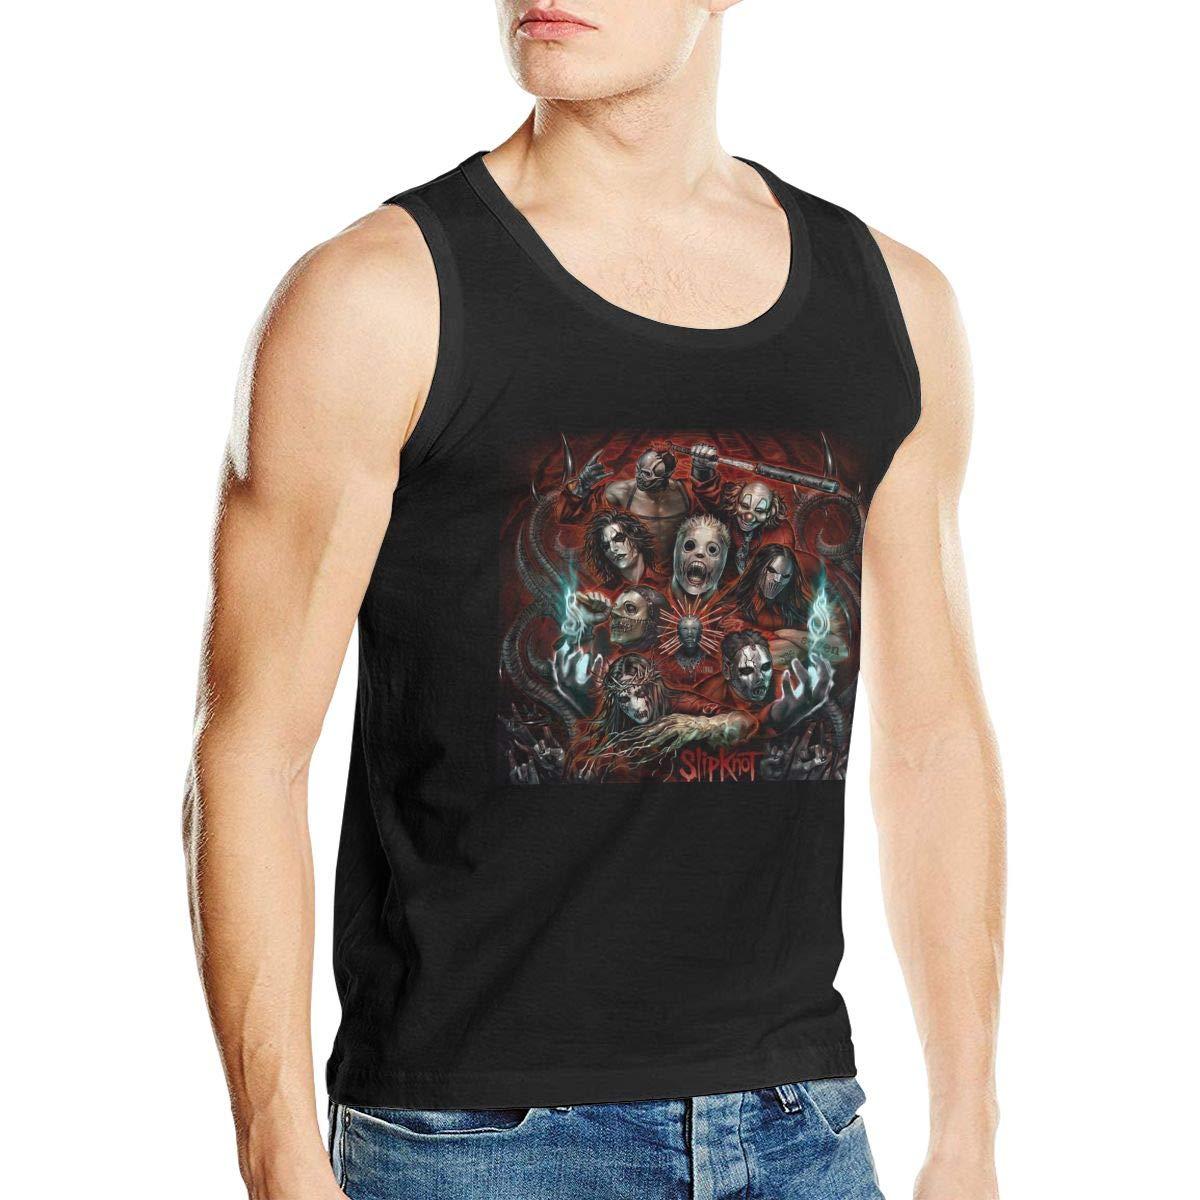 Slipknot Man Stylish Sleeveless No Pocket Mens Tank Top Shirt